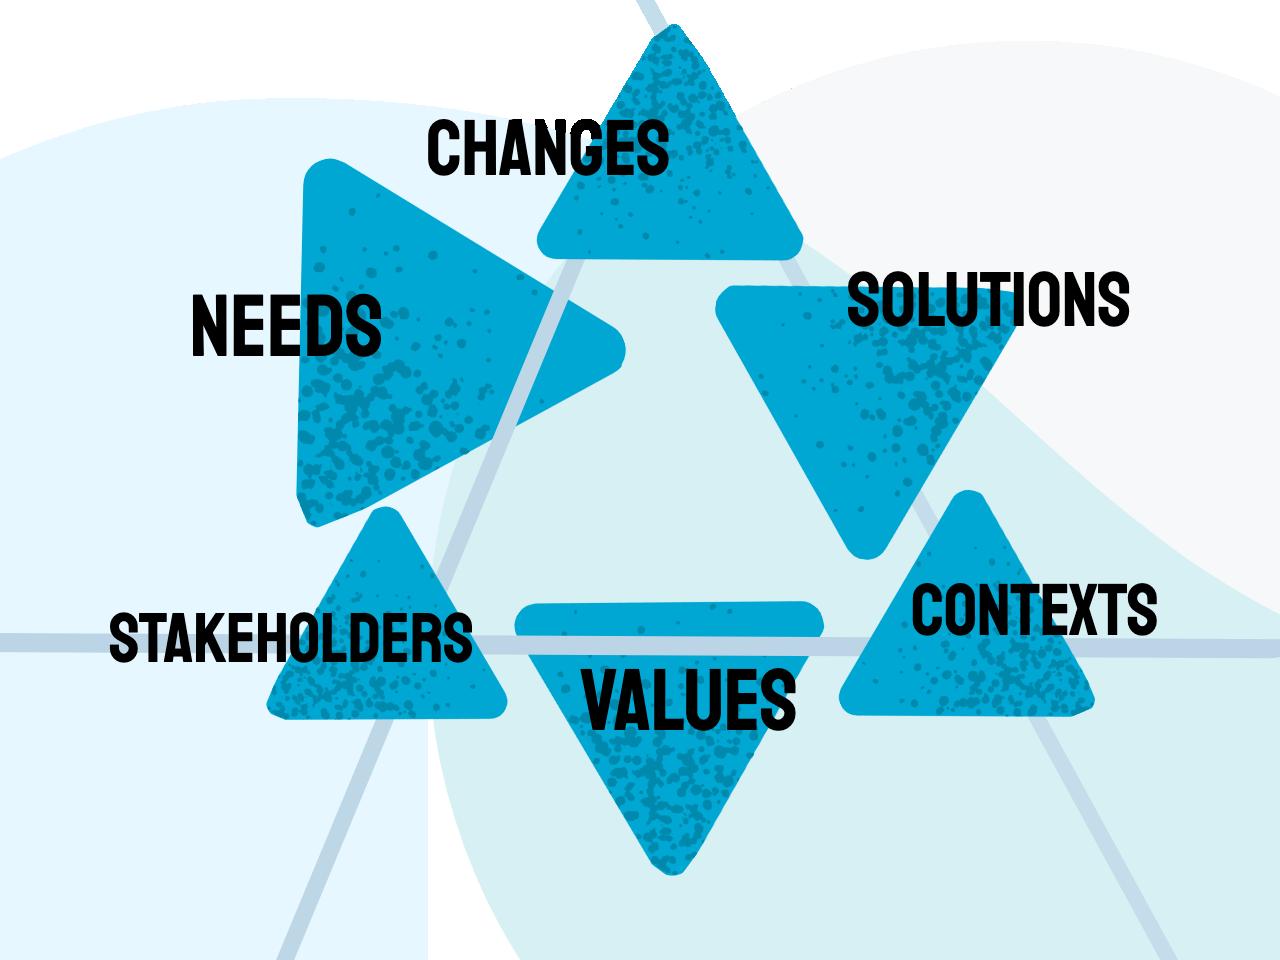 Guide to Business Analysis based on IIBA